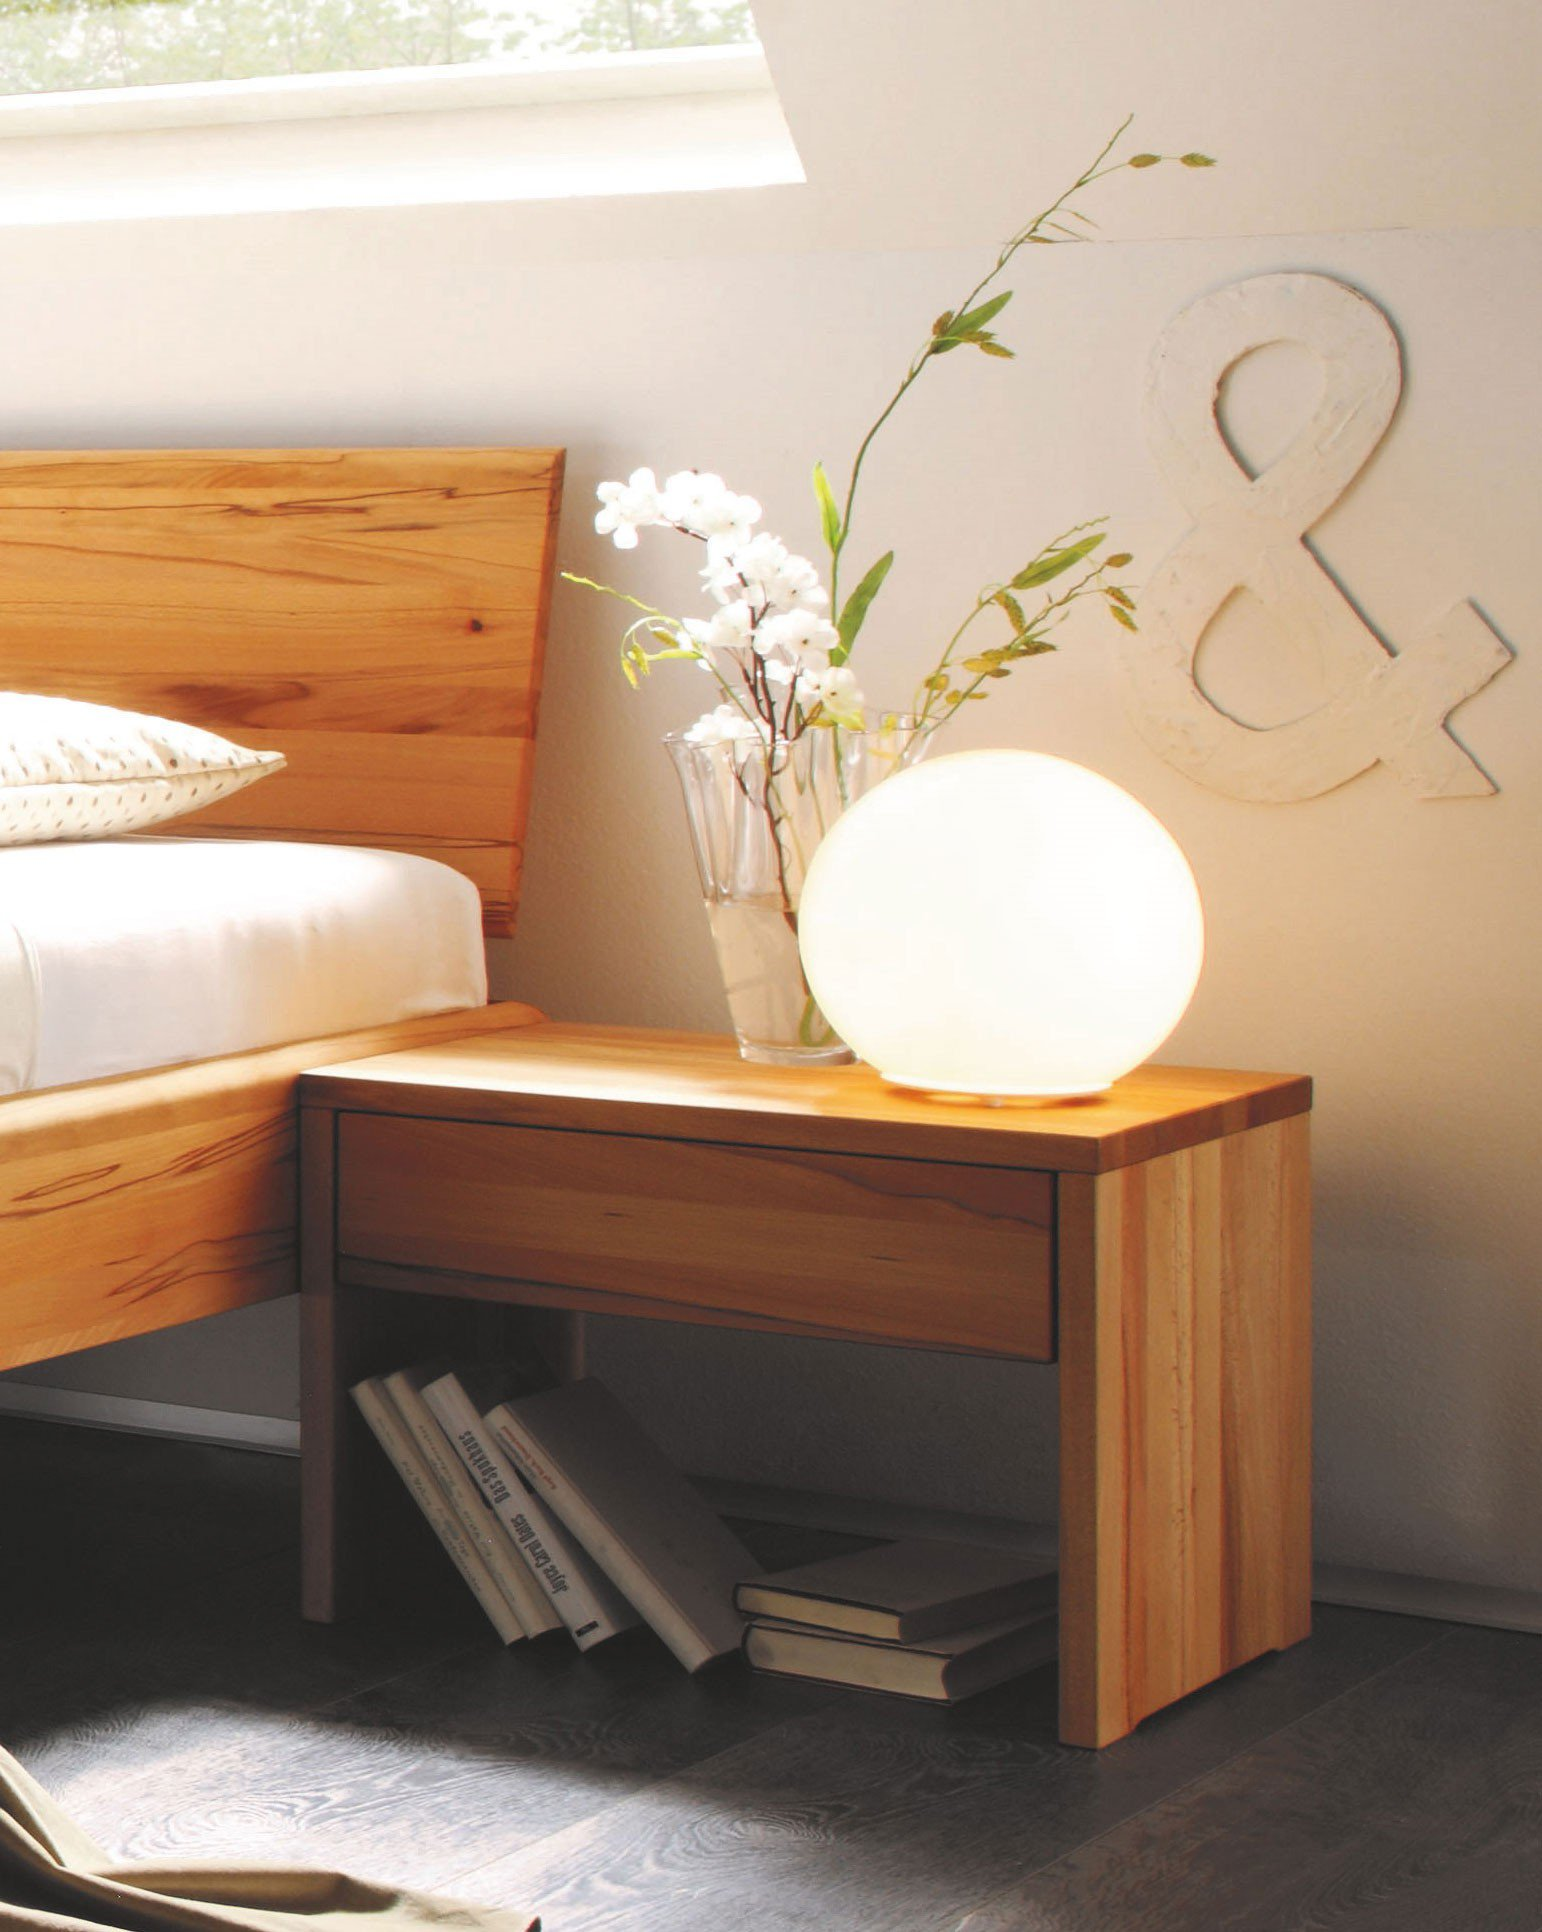 m h bett 1020 kernbuchenholz m bel letz ihr online shop. Black Bedroom Furniture Sets. Home Design Ideas